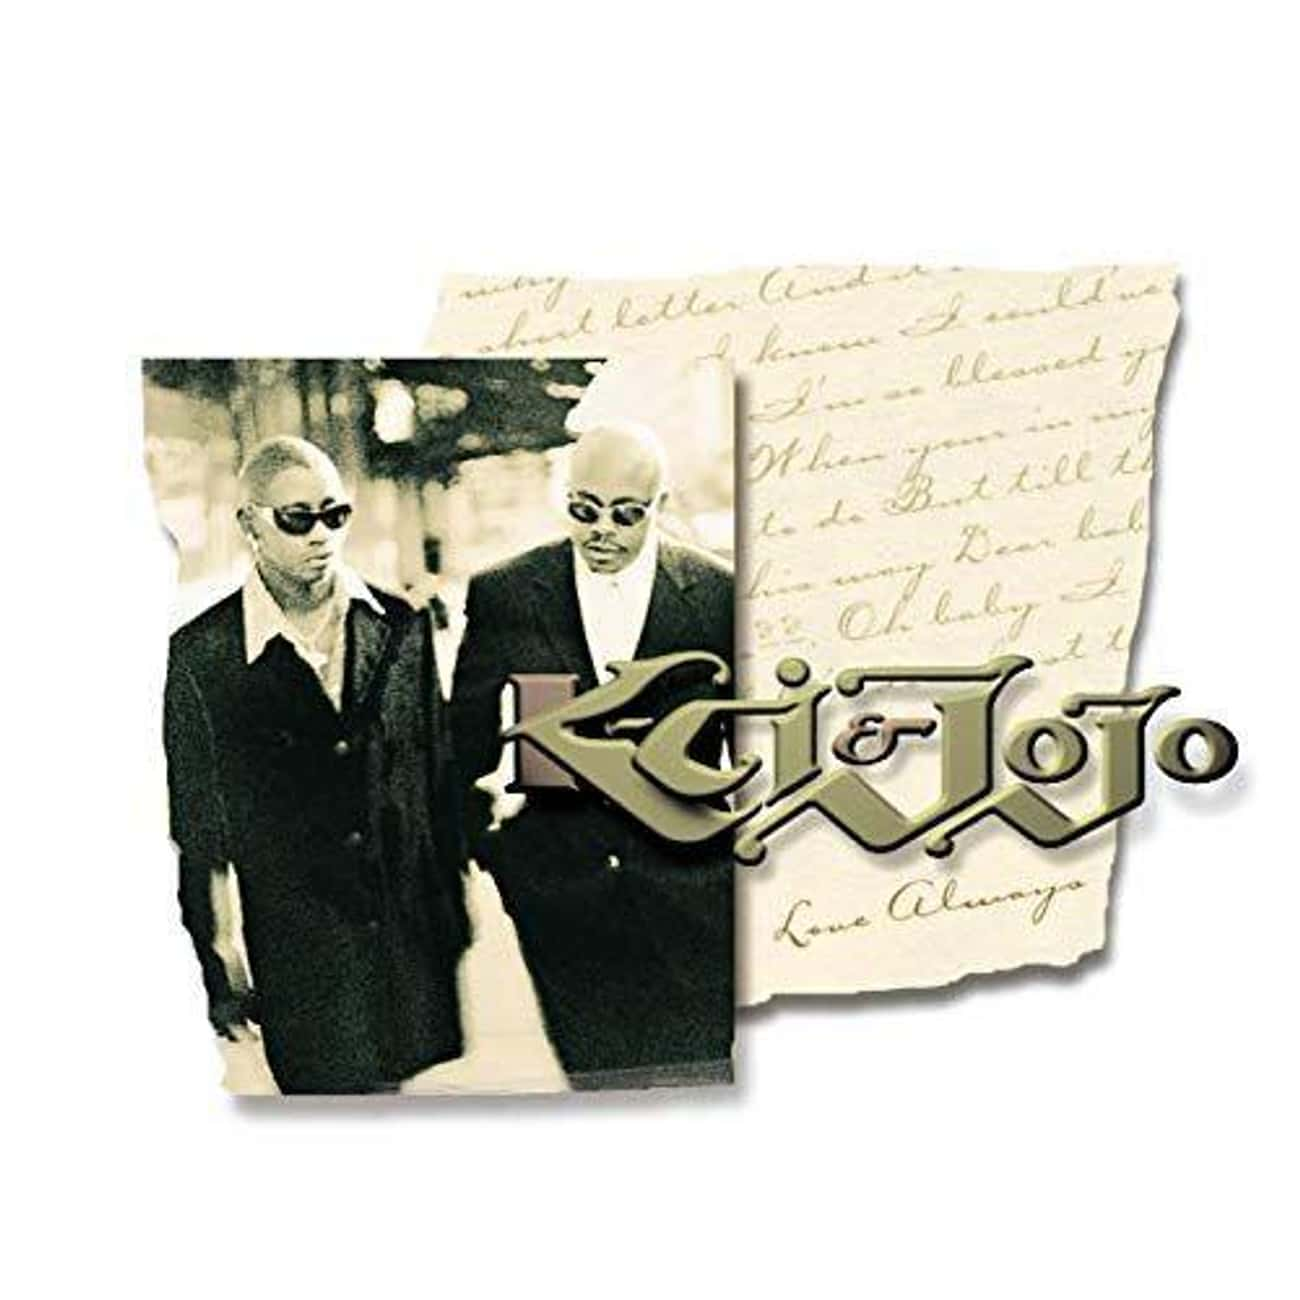 KC & JoJo: 'All My Life'